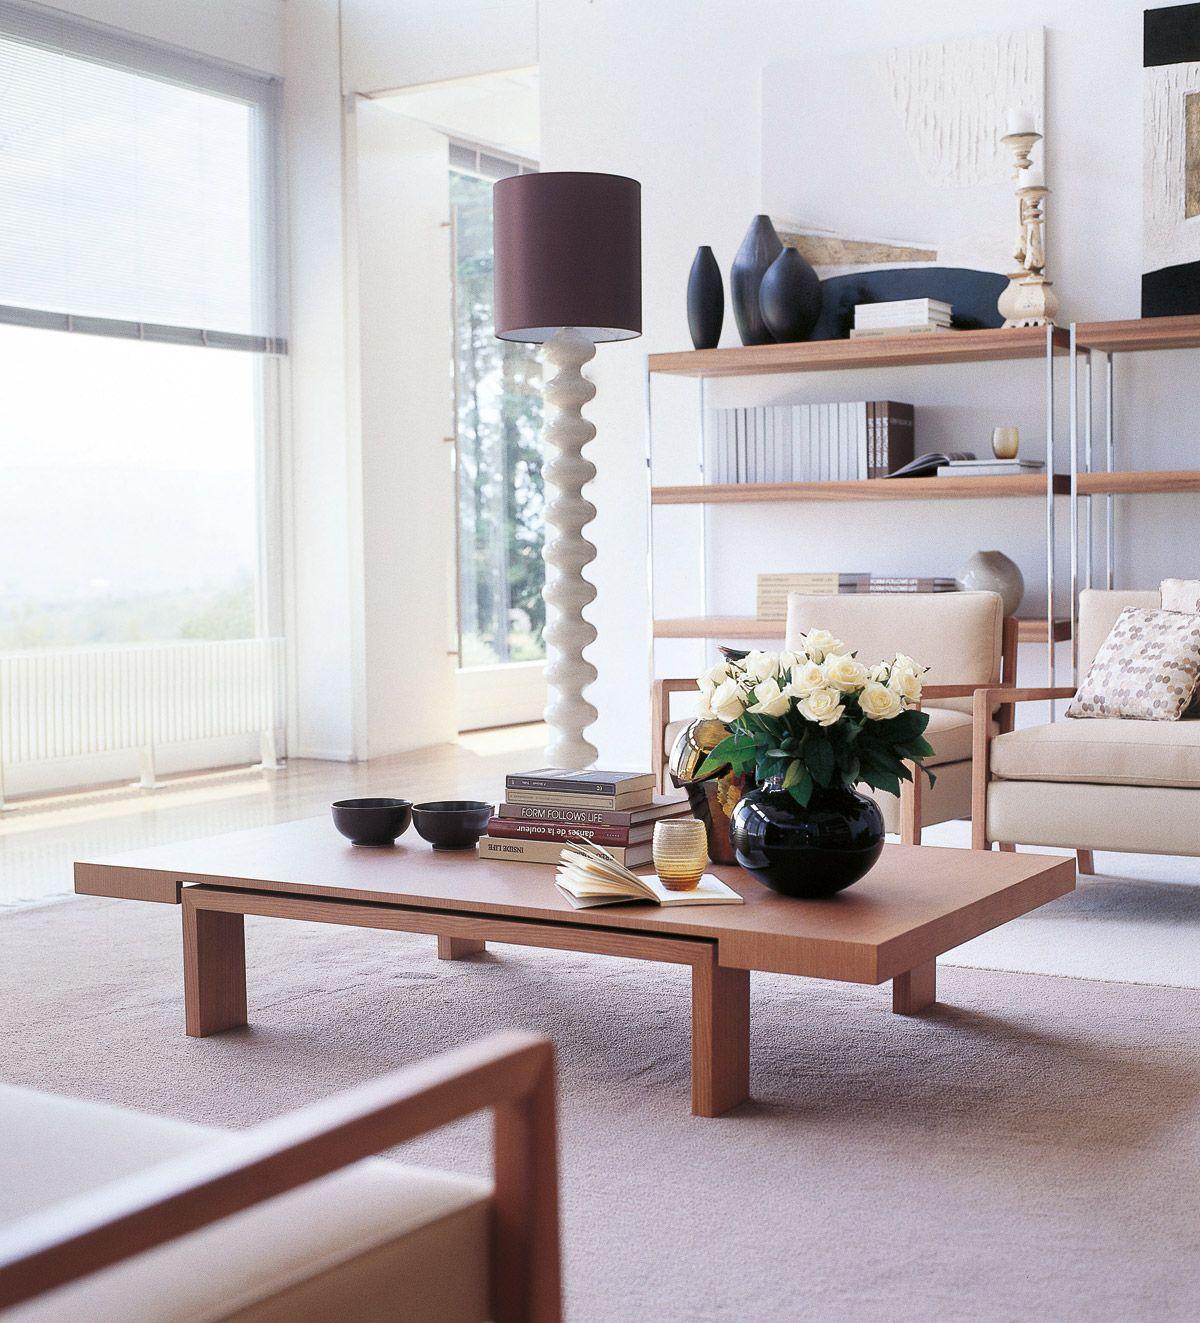 Bryant tavolino TAVOLINI IT Mobili, Design per il